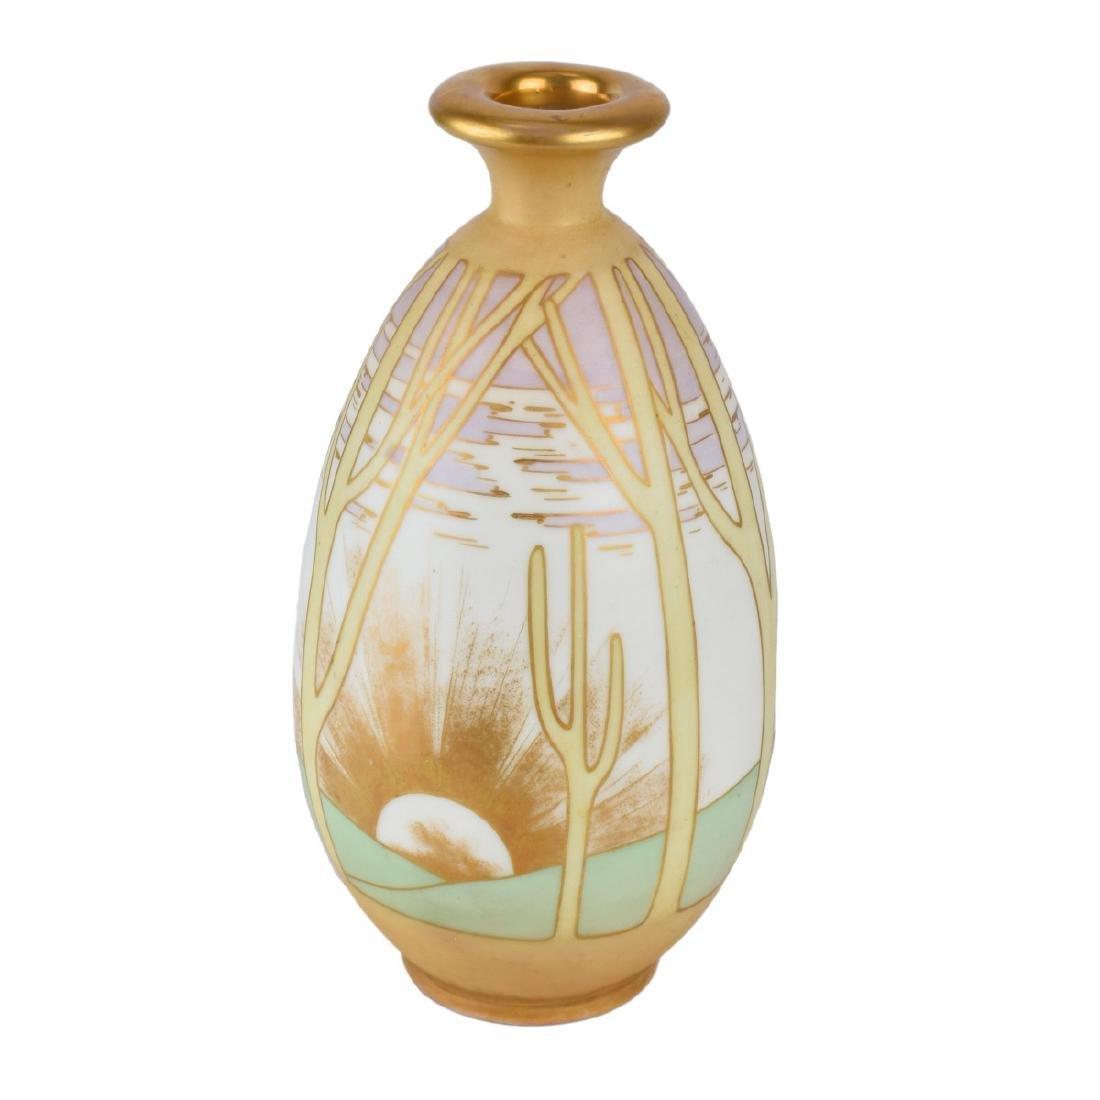 Turn Teplitz Amphora Pottery Vase - 4